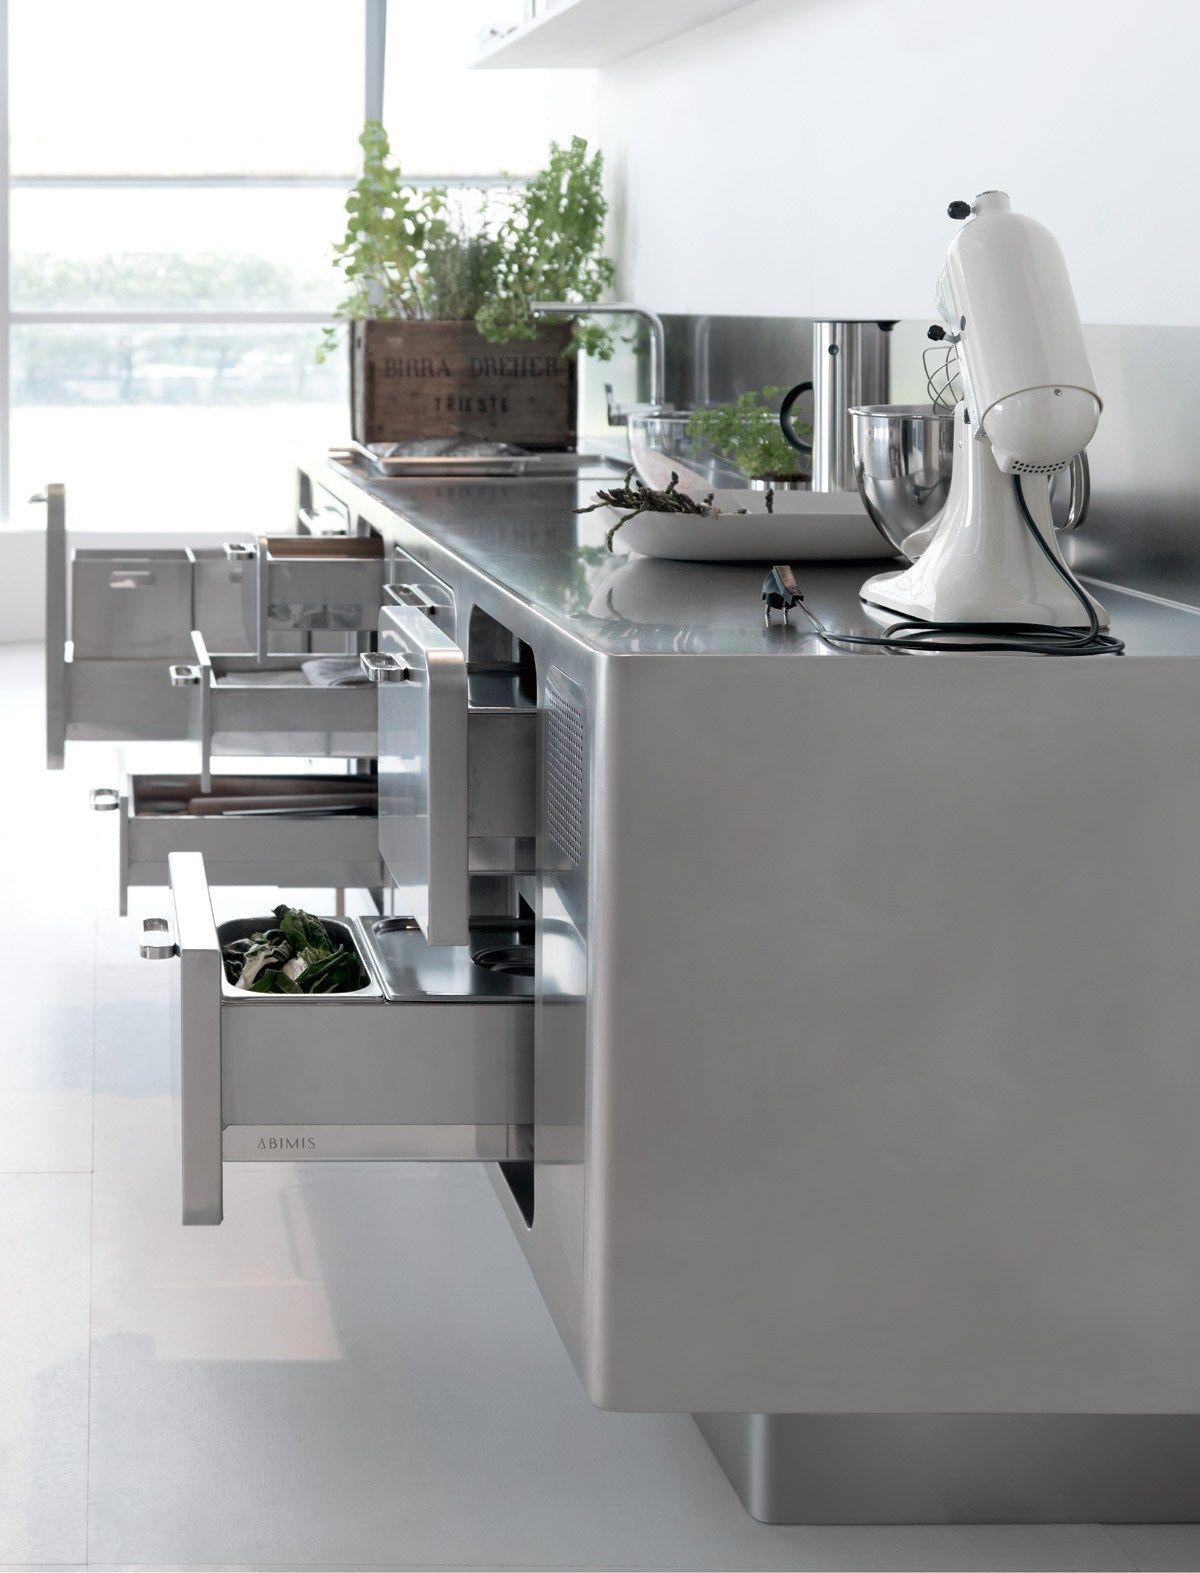 Cucina professionale in acciaio inox ABIMIS by ABIMIS by PRISMA ...